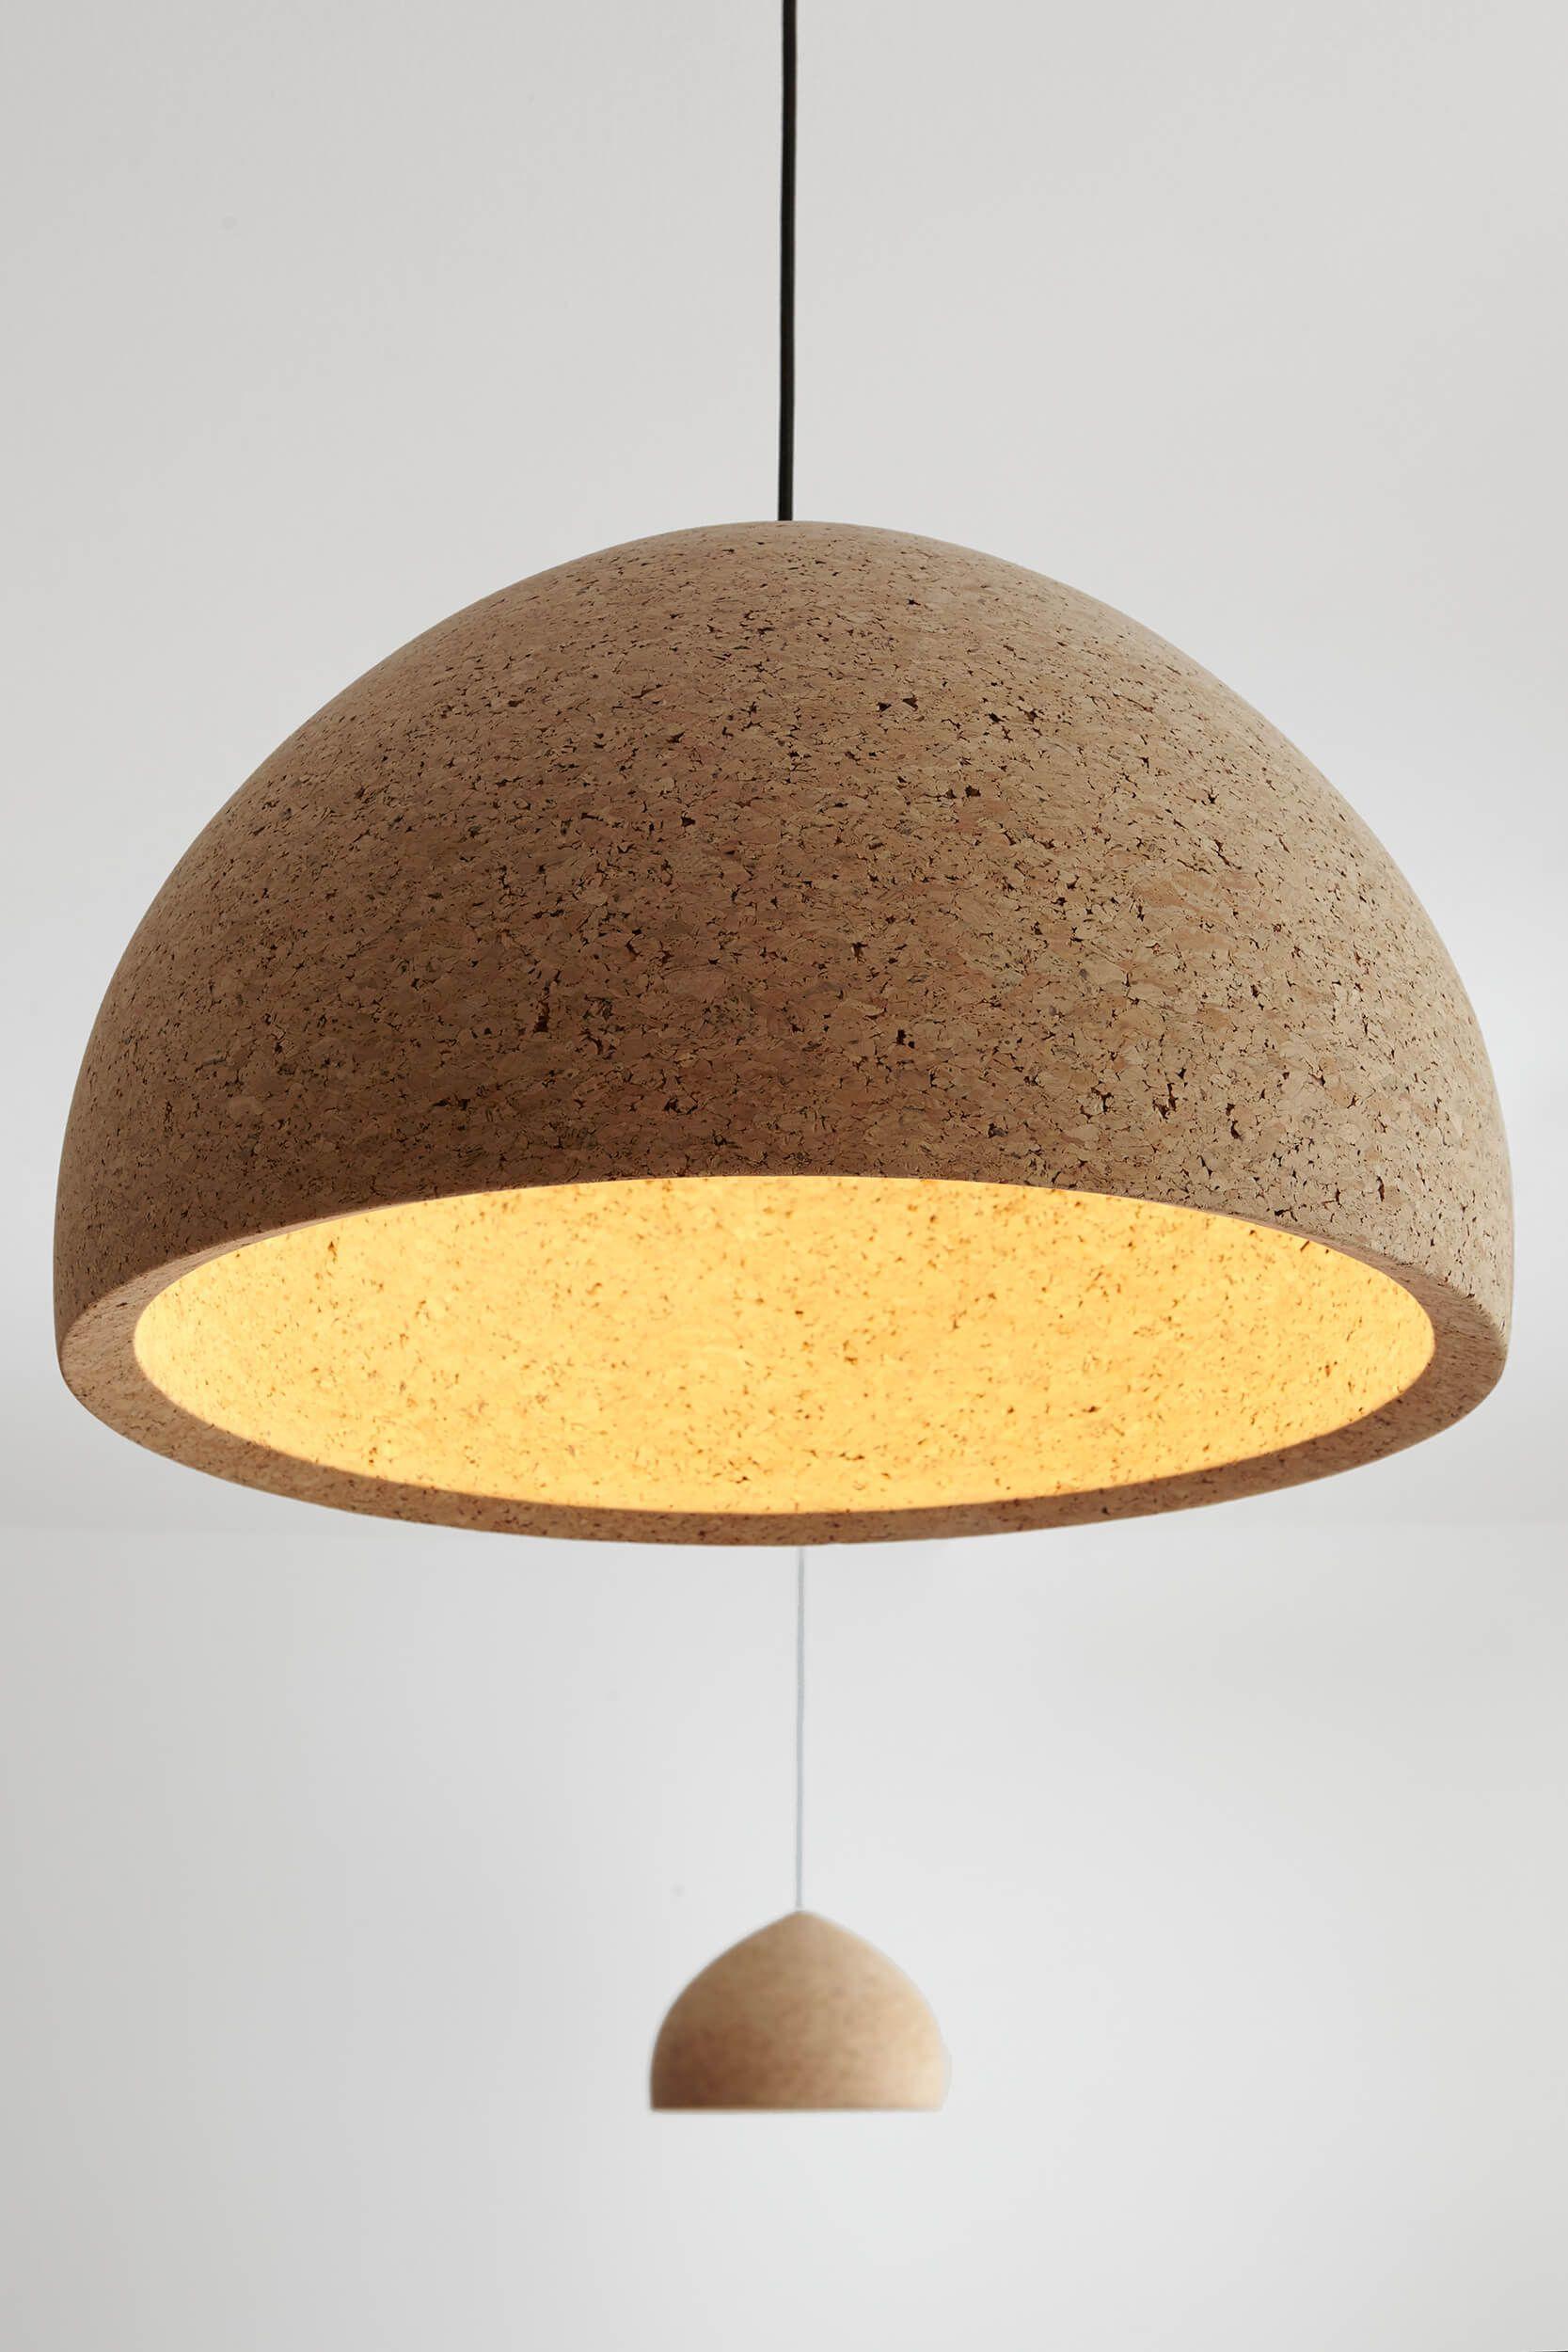 Original l mpara de corcho lamps we like for Lamparas para apartamentos pequenos